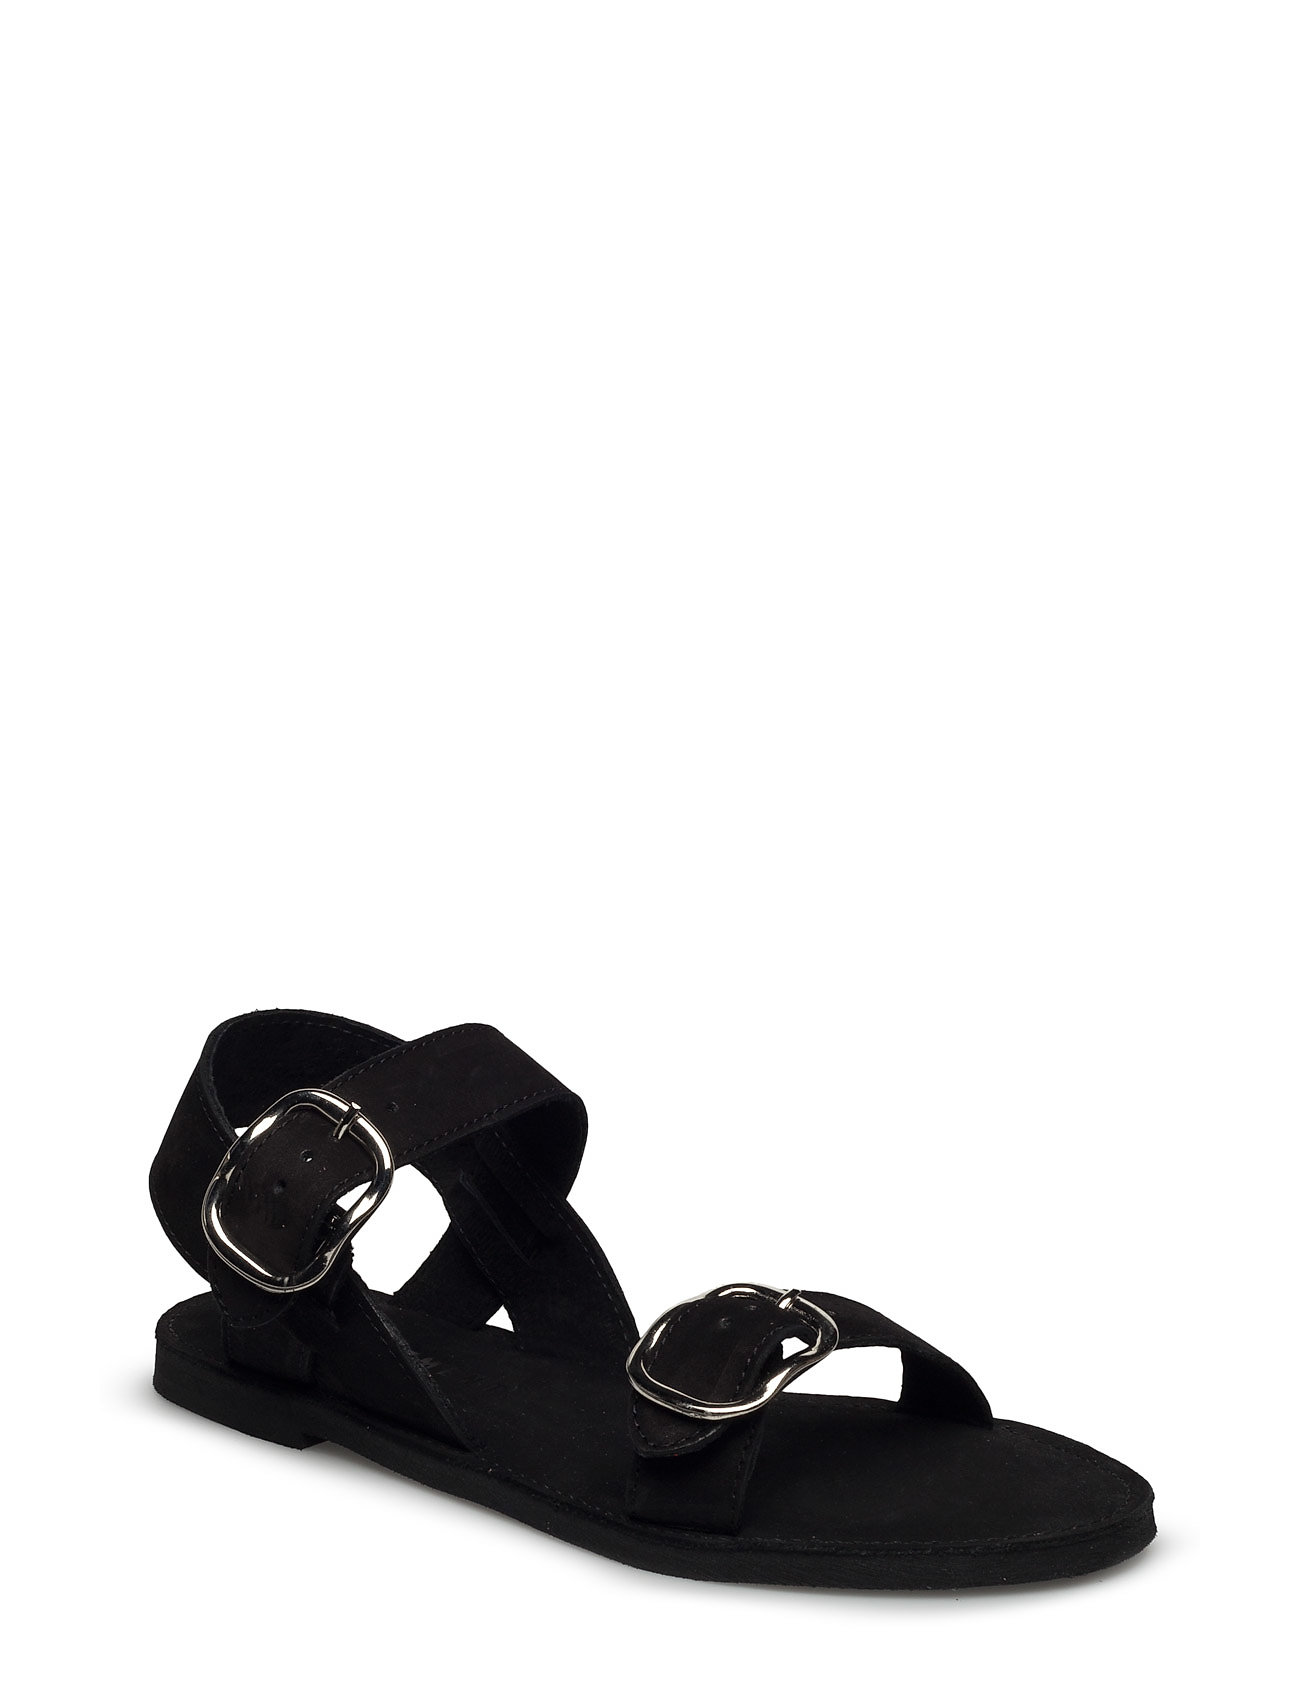 Vilma Pavement Sandaler til Damer i Sort